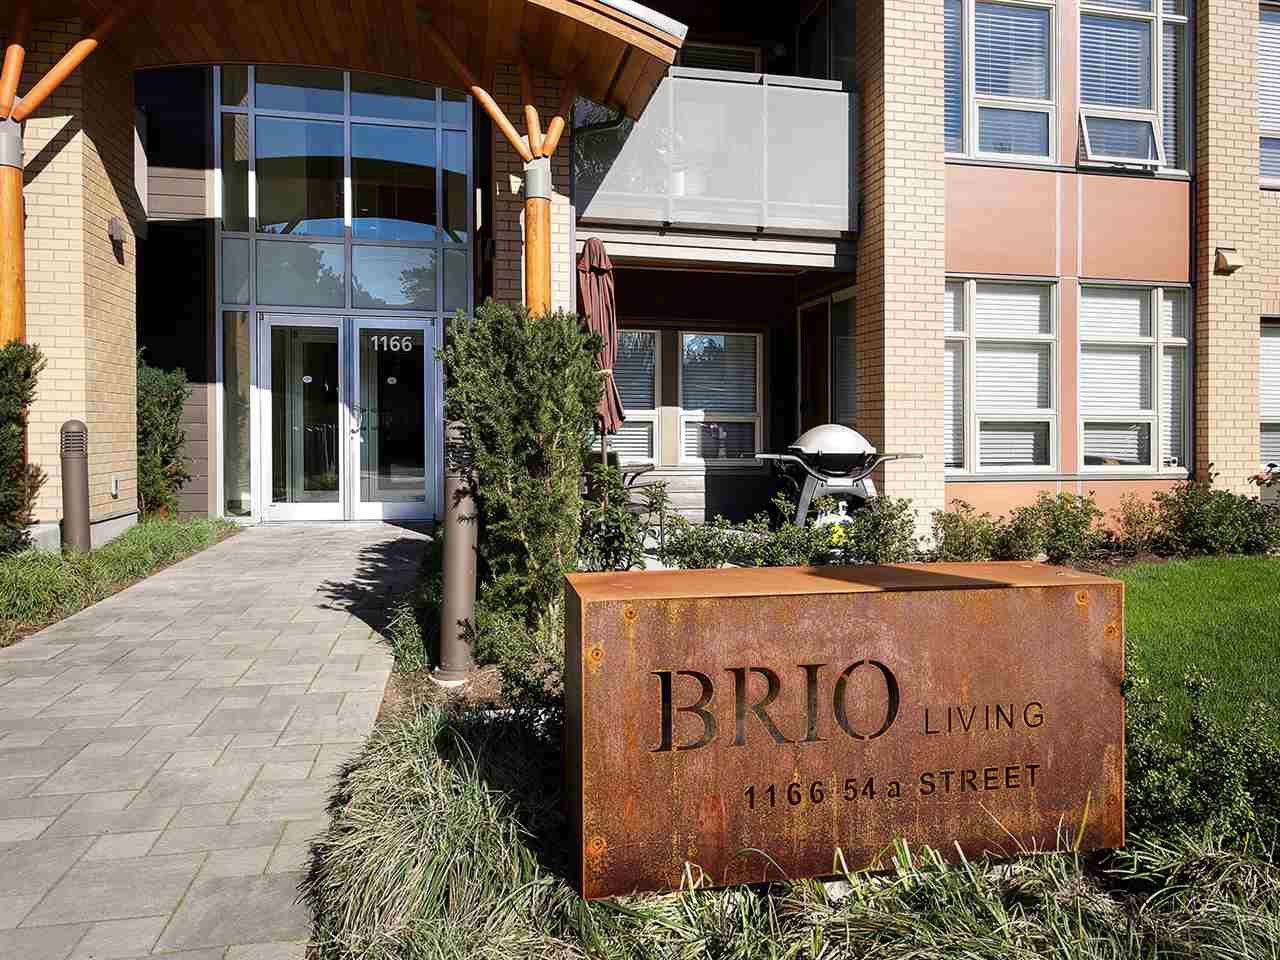 "Main Photo: 113 1166 54A Street in Delta: Tsawwassen Central Condo for sale in ""BRIO"" (Tsawwassen)  : MLS®# R2156301"